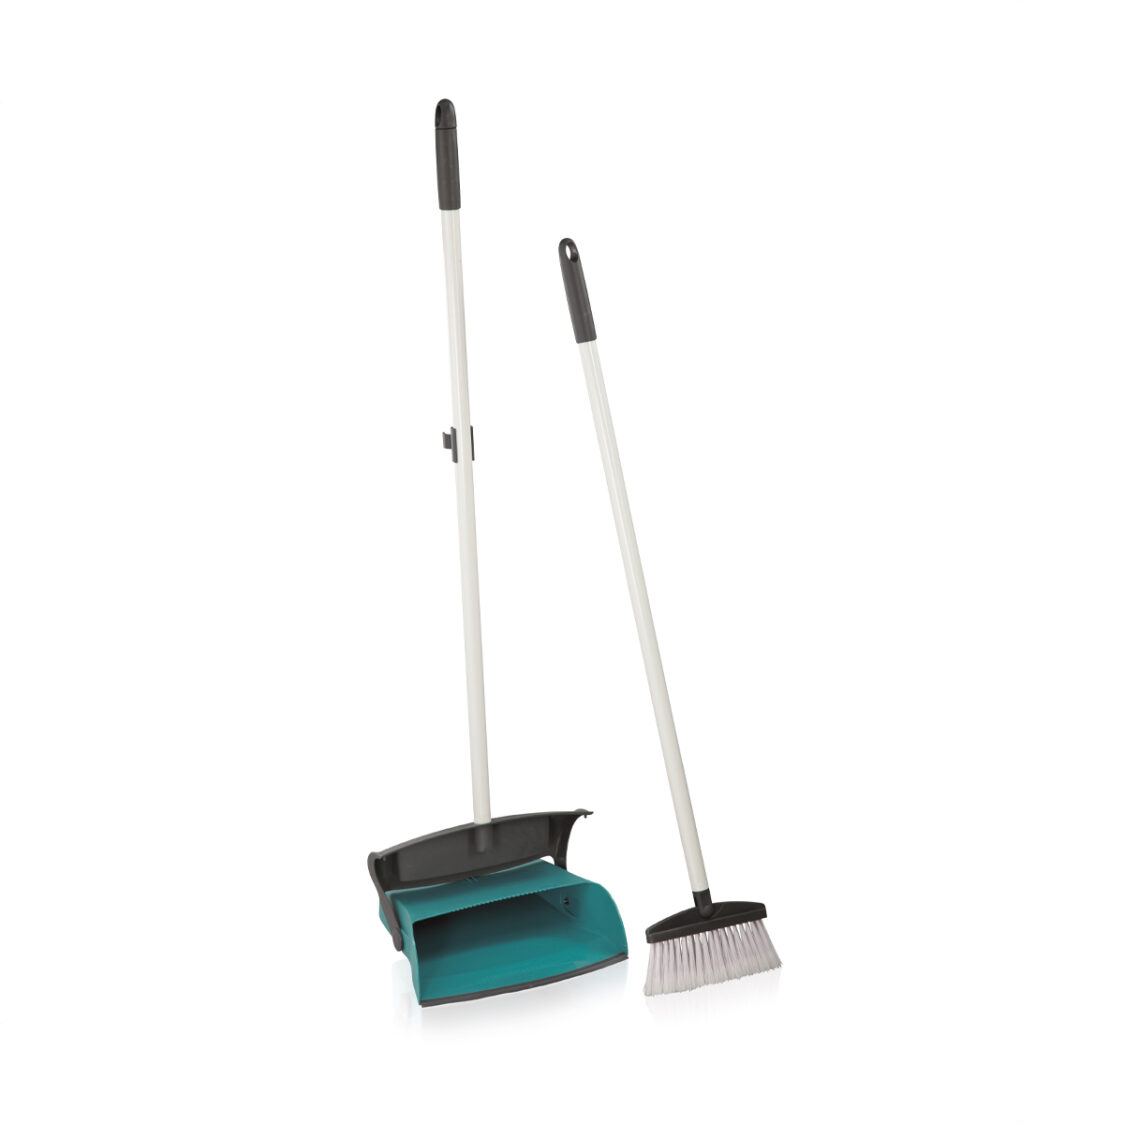 Leifheit Professional Sweeper Set